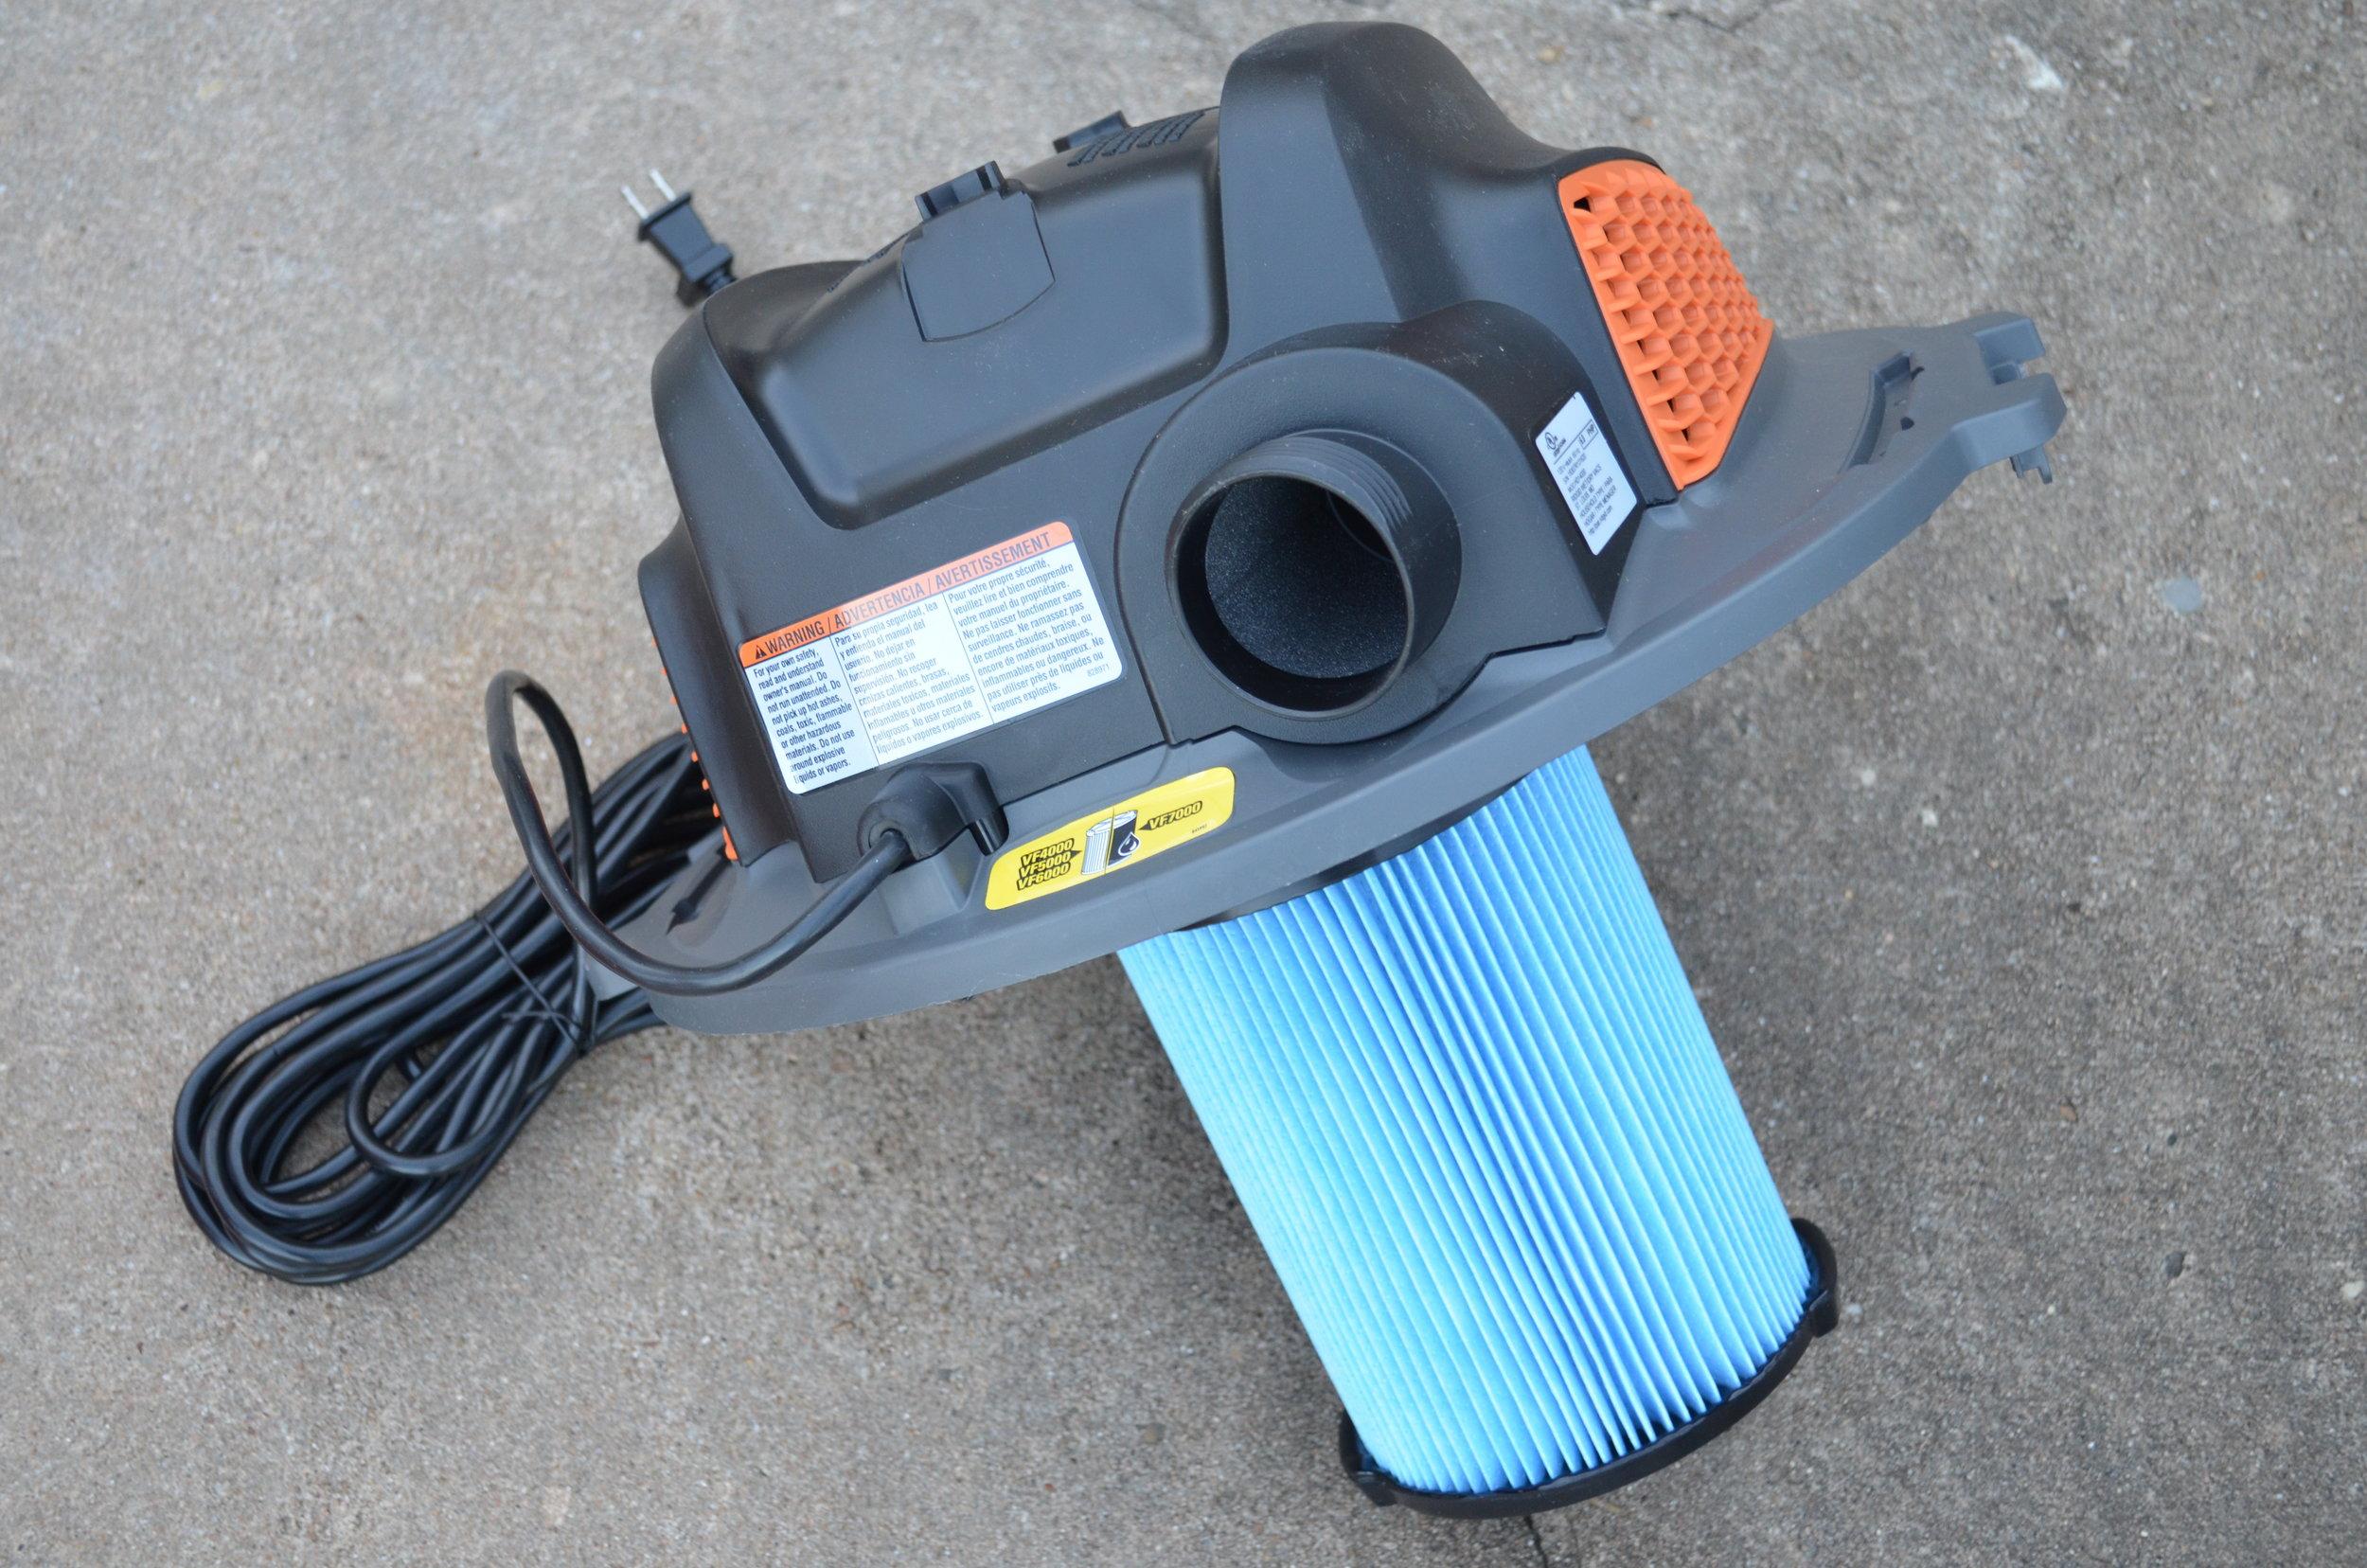 ridgid-6hp-14gal-wet-dry-nxt-vacuum